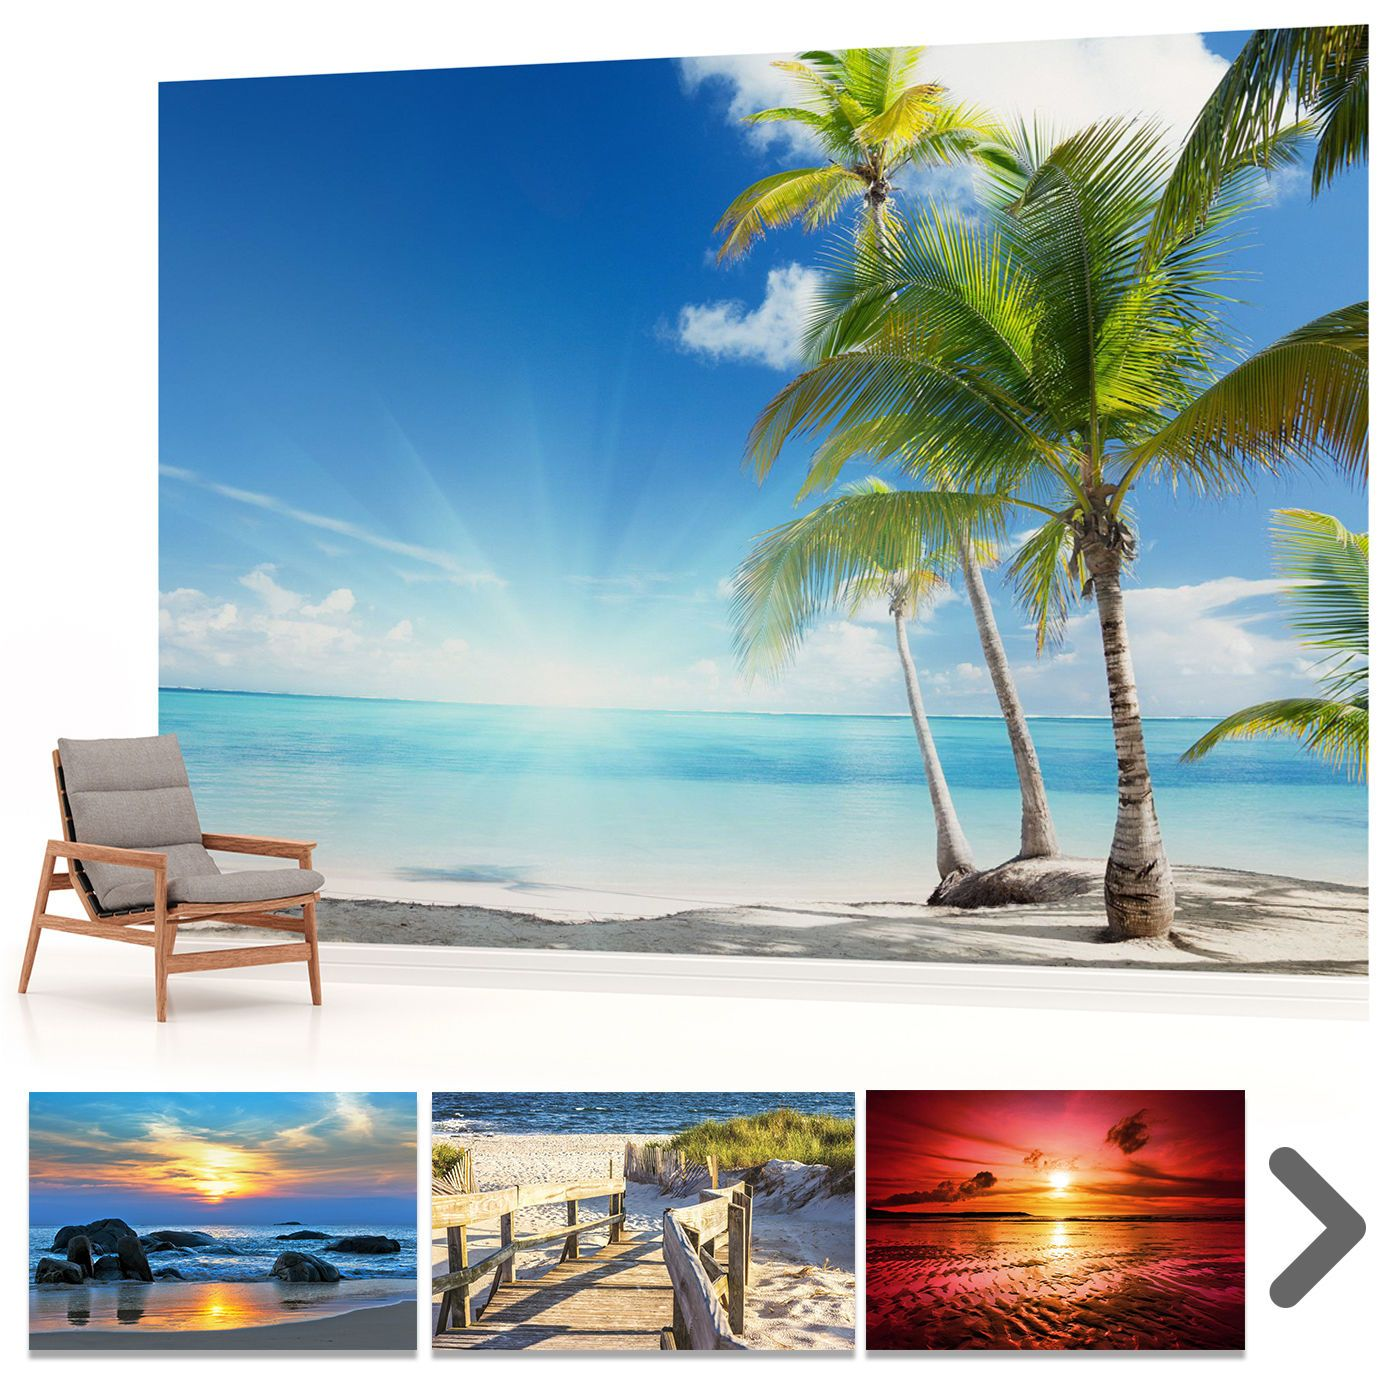 FOTOTAPETE WANDBILD FOTOTAPETEN BILD TAPETE Strand Meer Sonnenuntergang  VLIES VE   EUR 29,90. Finden Sie Tausende Wunderschöne Fototapeten,  Tapeten, ...